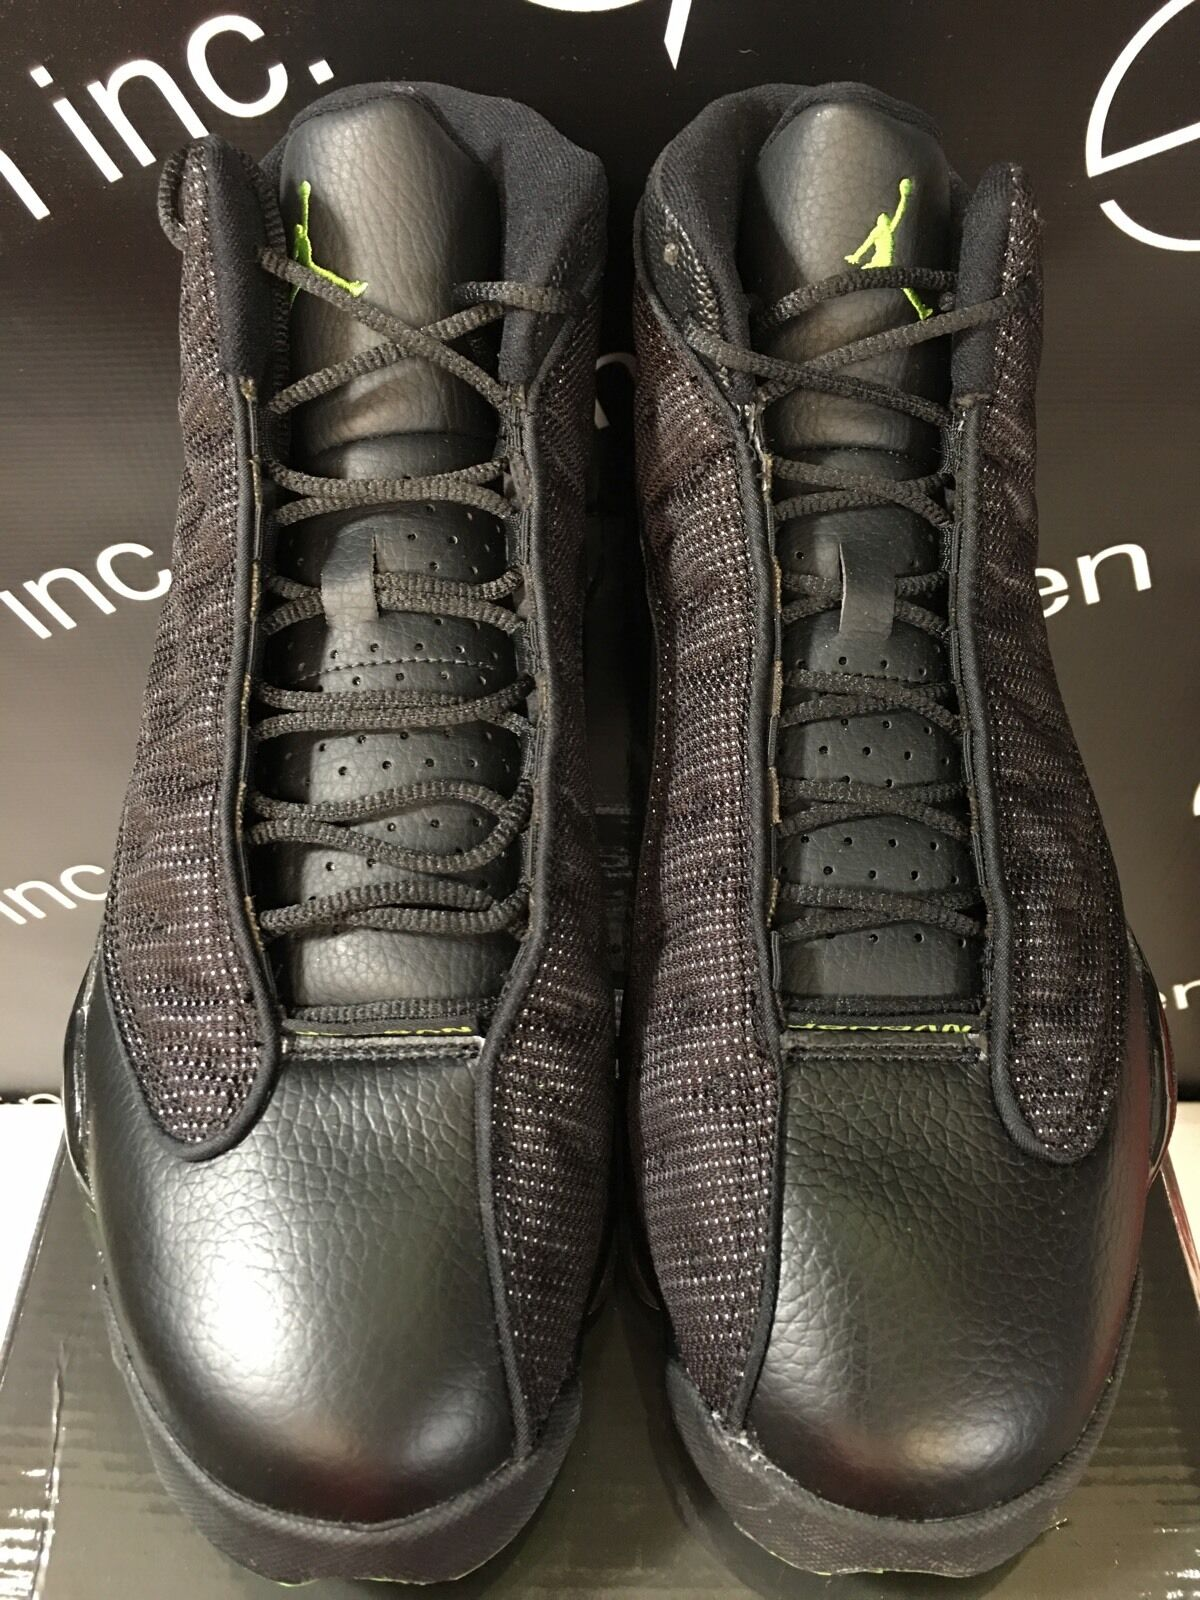 Authentic Nike Air Jordan 13 XIII Altitude Black Altitude Green Size 10.5